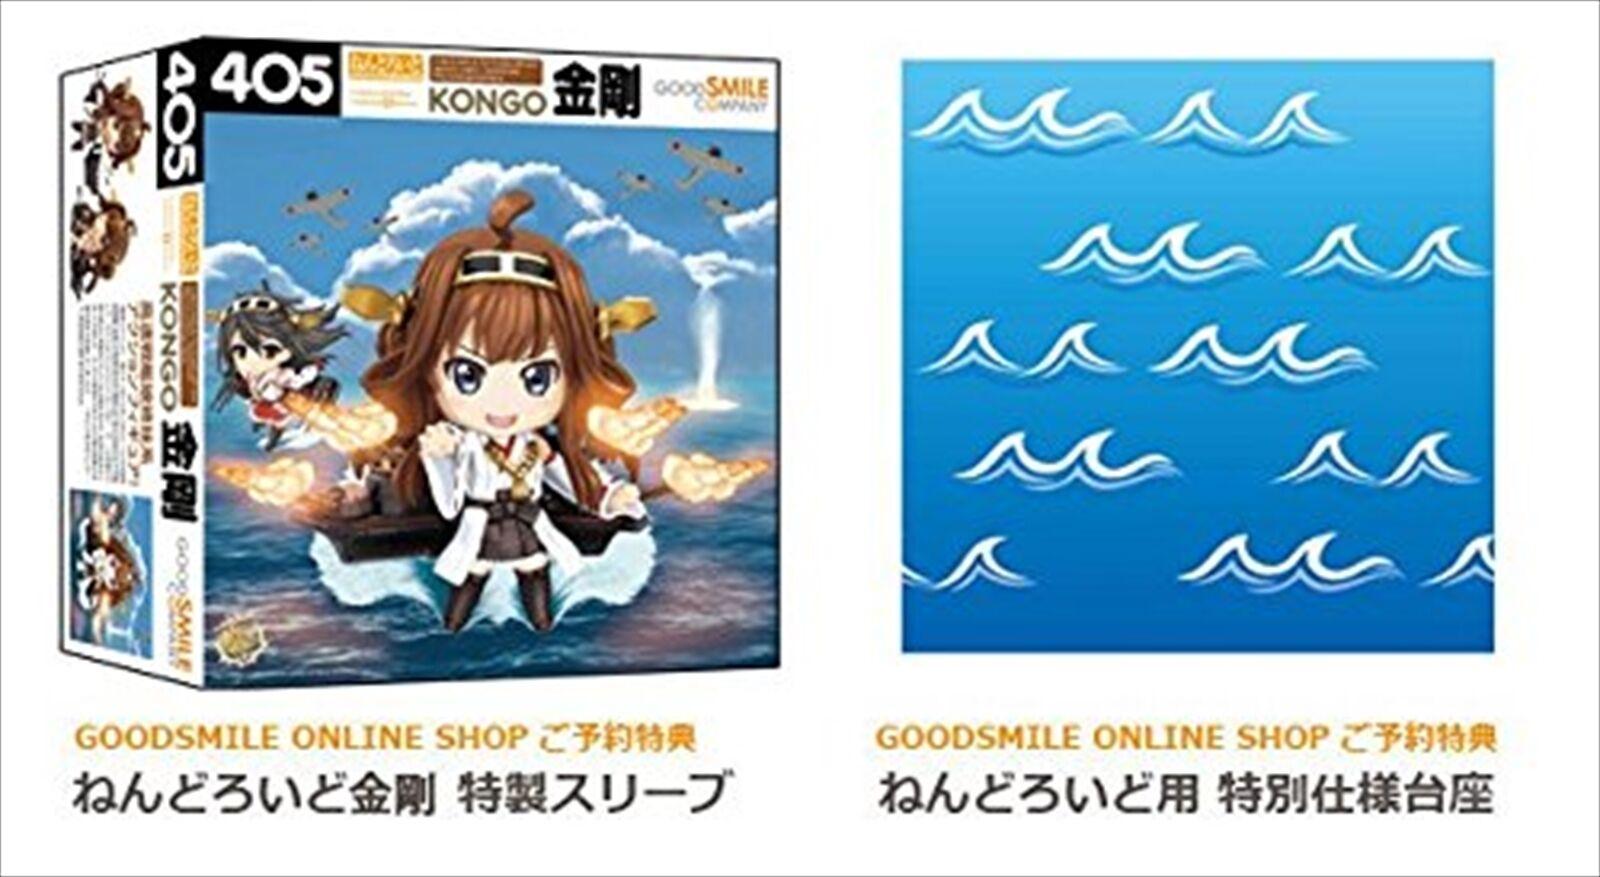 Good Smile Kantai Collection Kancolle Kongo Nendoroid Figure OnlineShop Limited